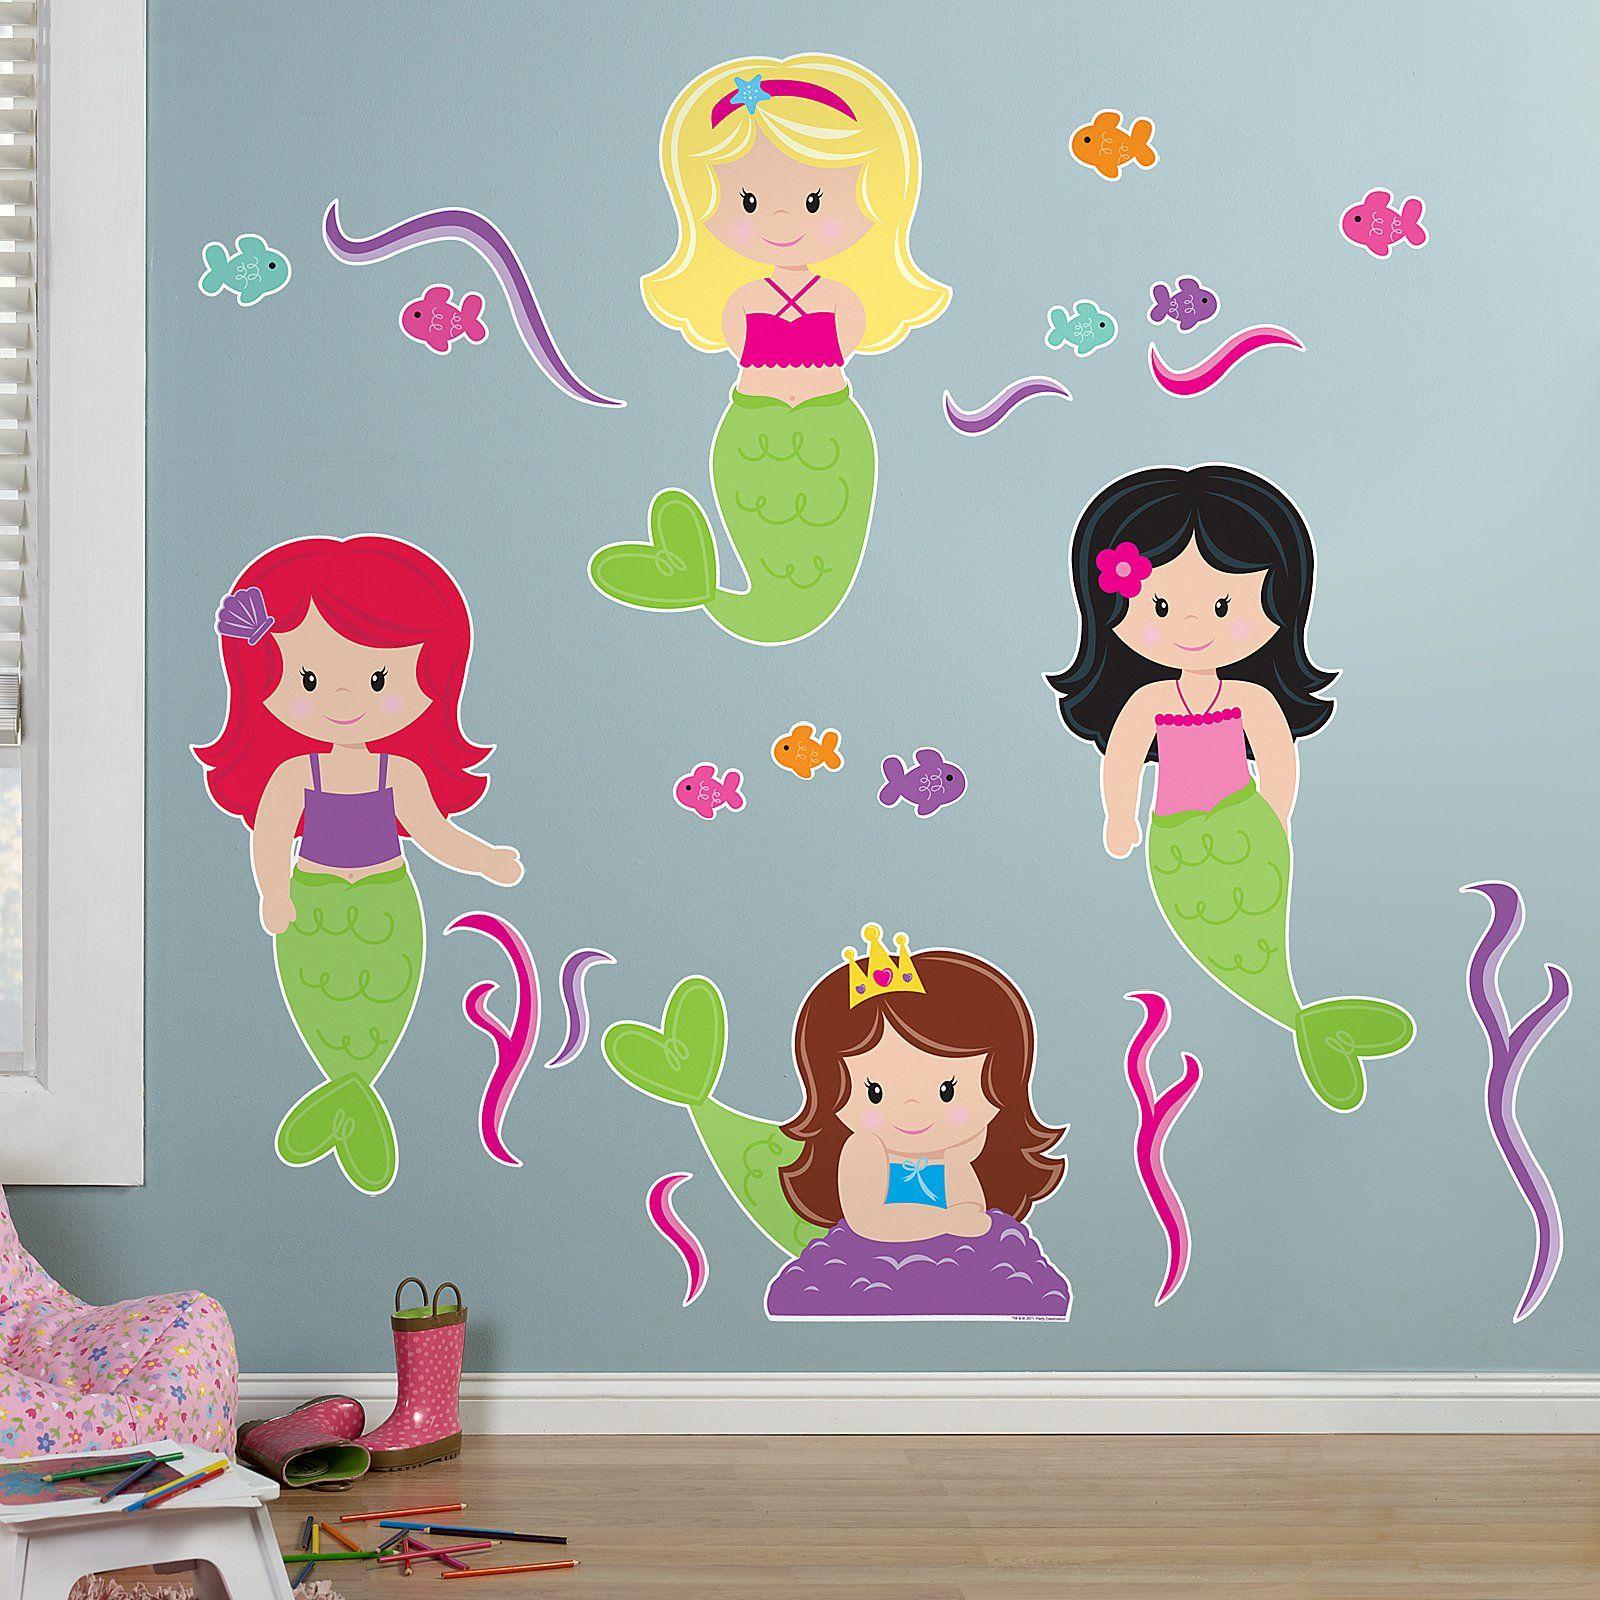 Mermaids Giant Wall Decals 78347 Kids Stuff Pinterest